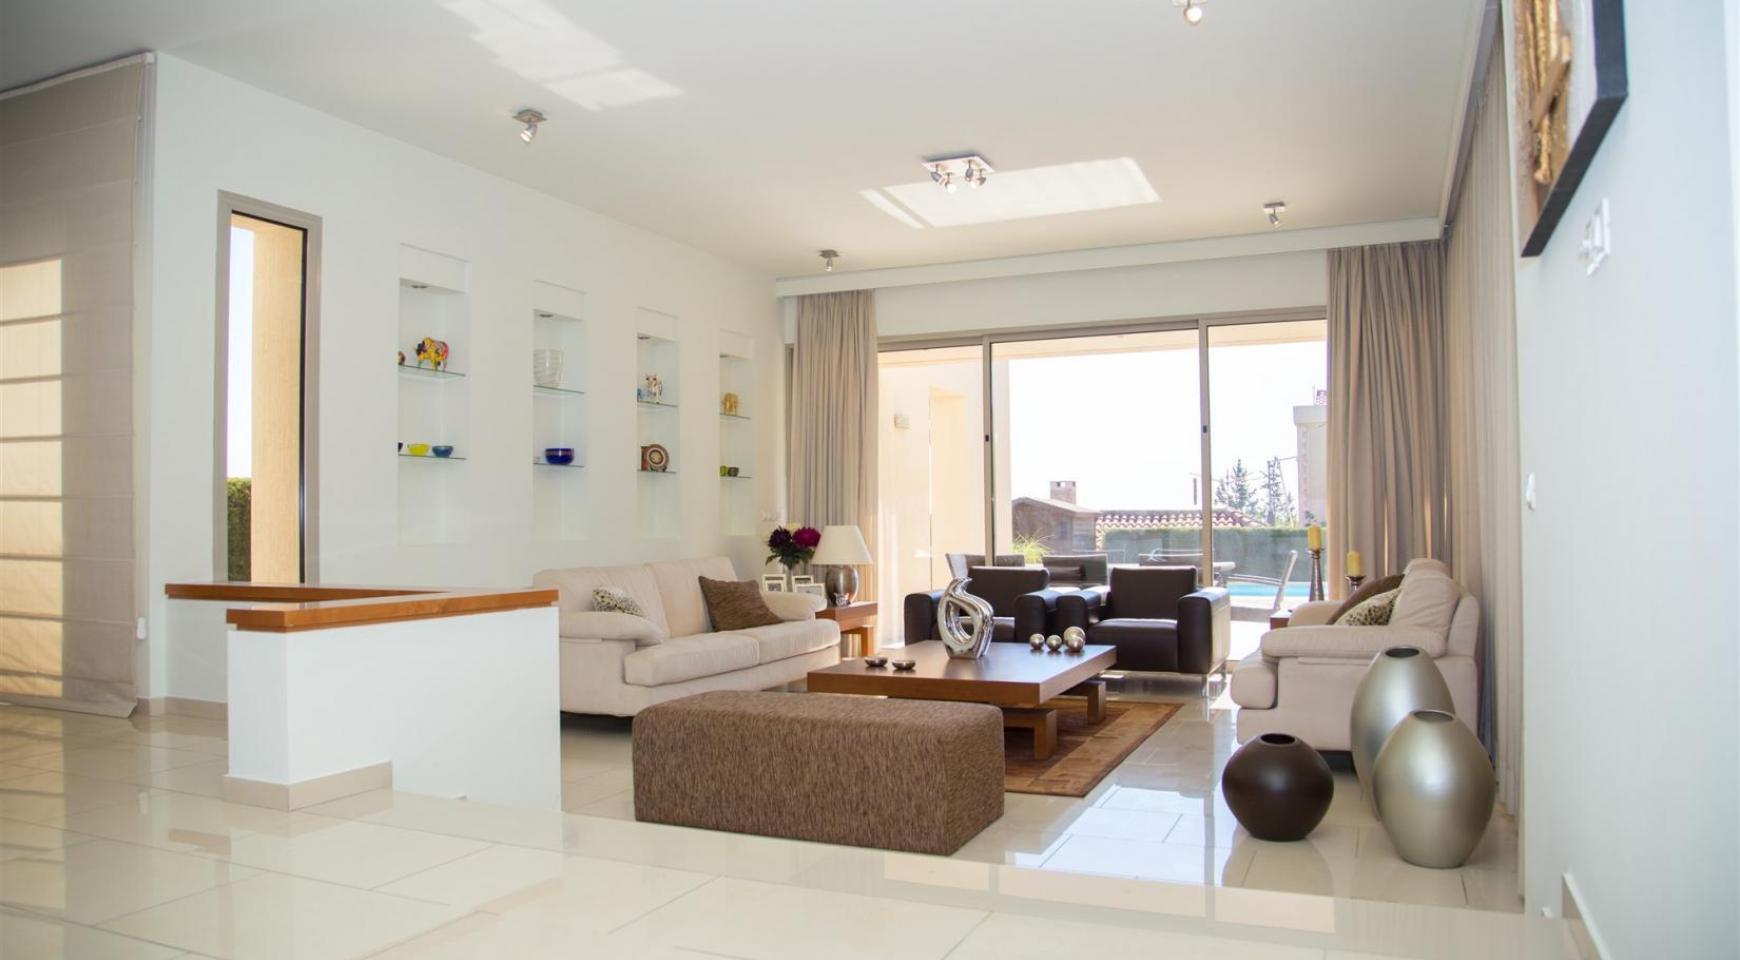 Modern Luxury 4 Bedroom Villa in Sfalagiotisa, Agios Athanasios - 15